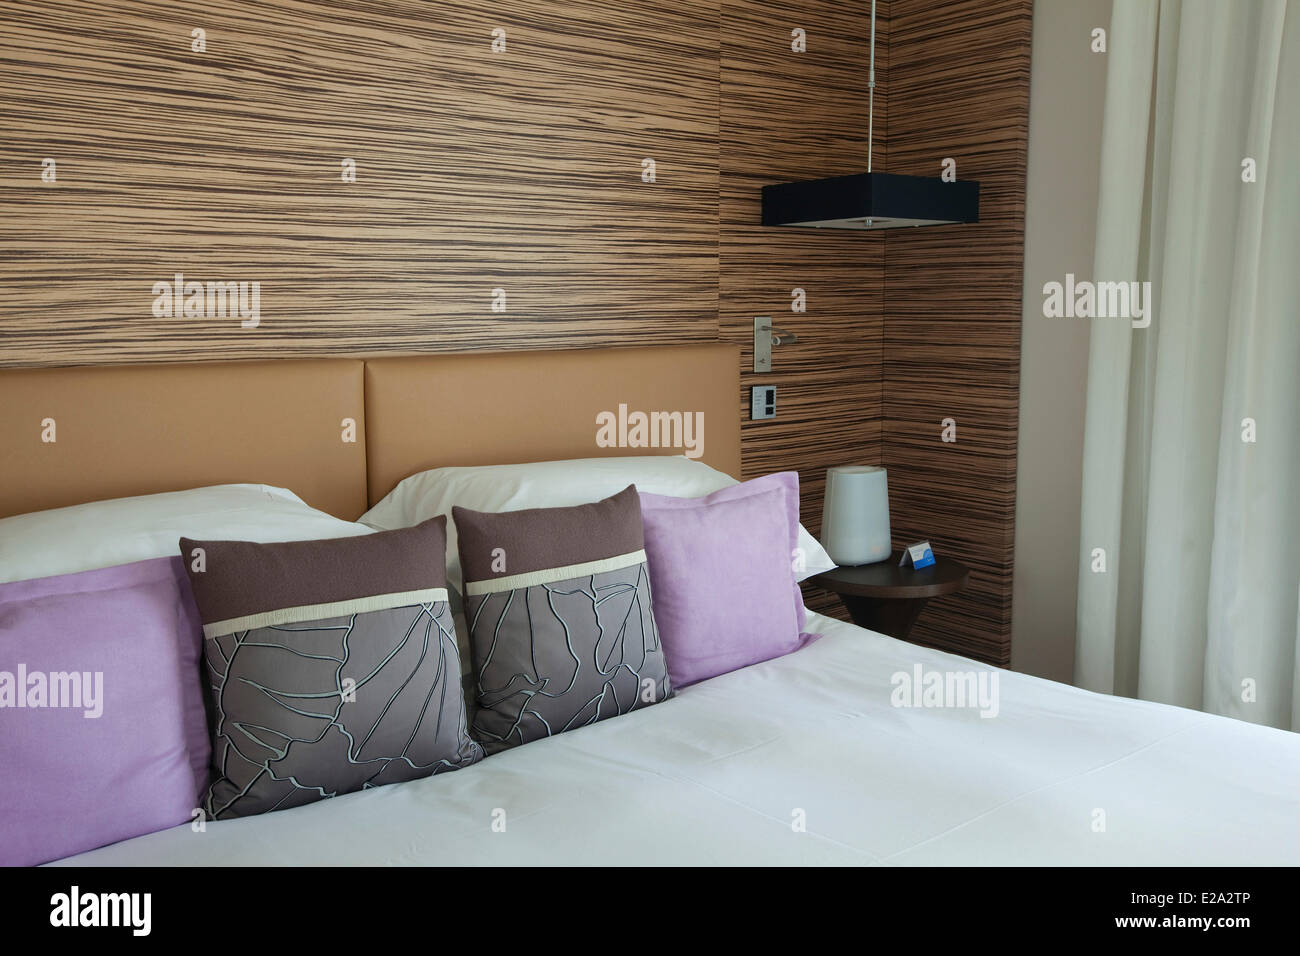 Francia, Alpes Maritimes, Cannes, Hotel Radisson Blu Hotel Room Immagini Stock